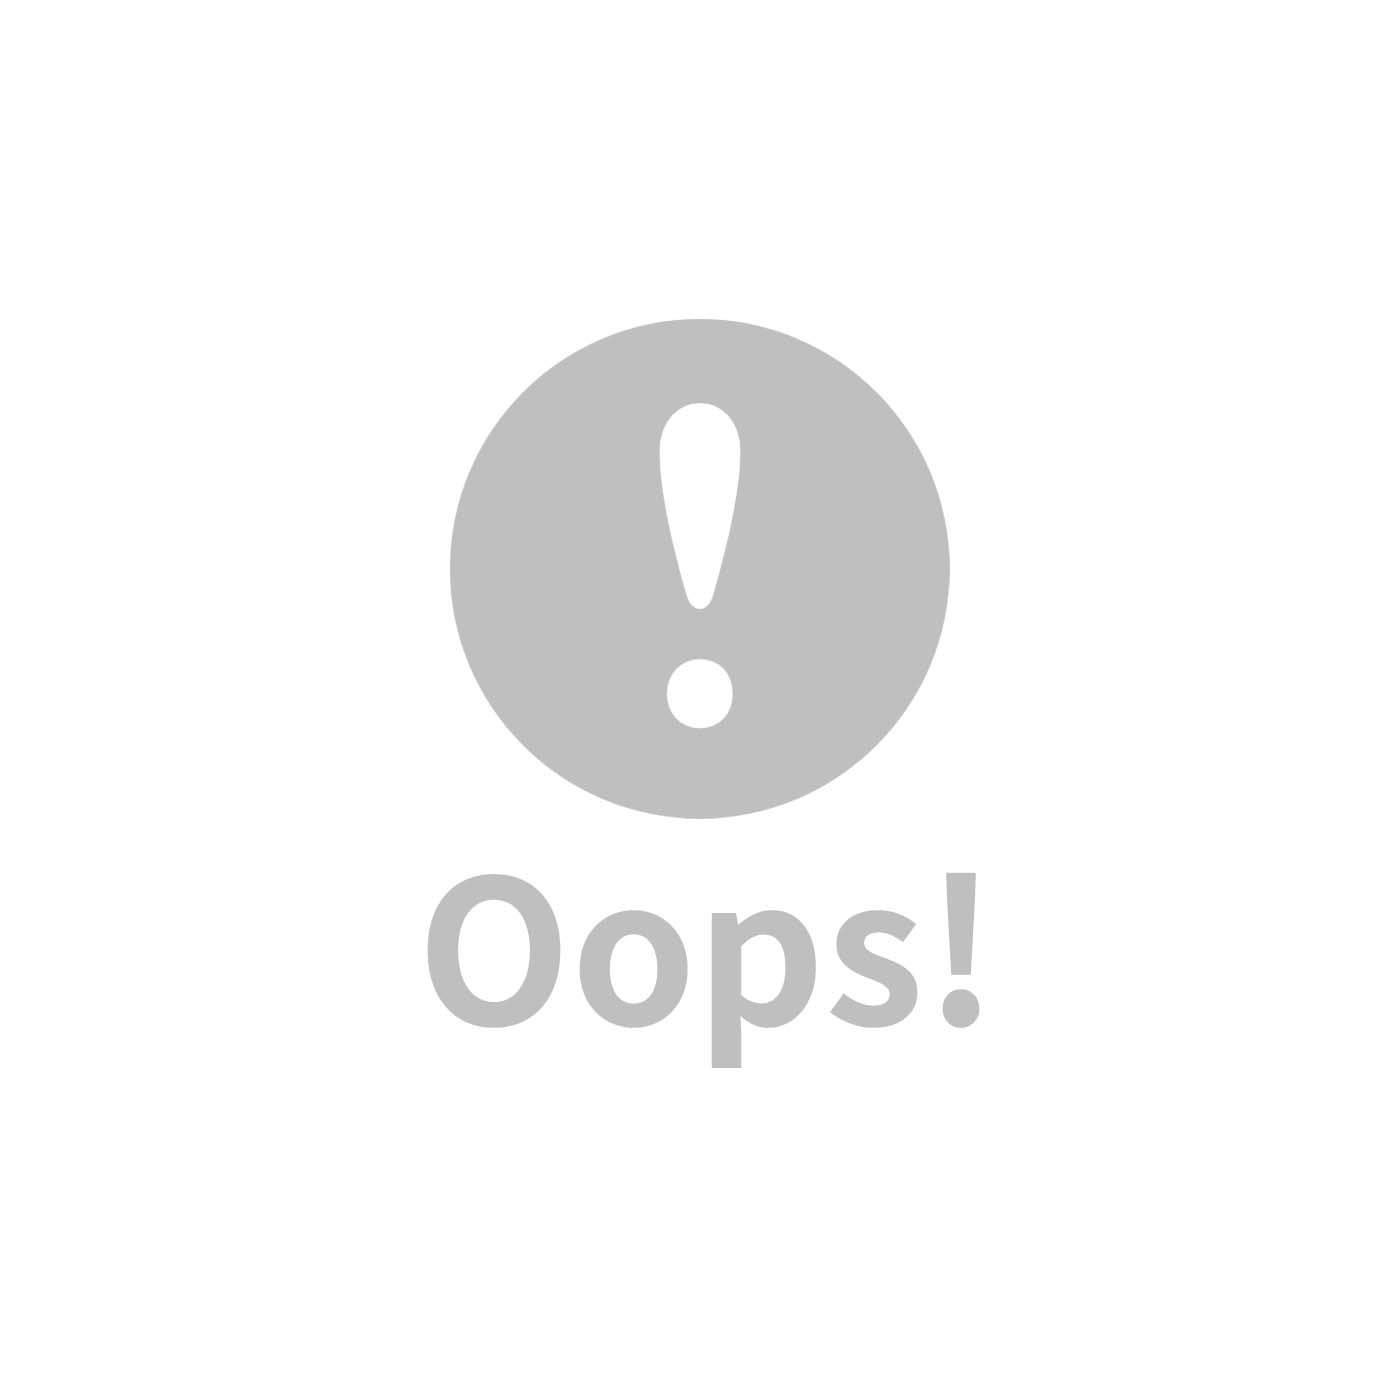 La Millou velvet頂級棉柔系列-雙面柔柔毯大人款-春日小雛菊(舒柔燻粉)